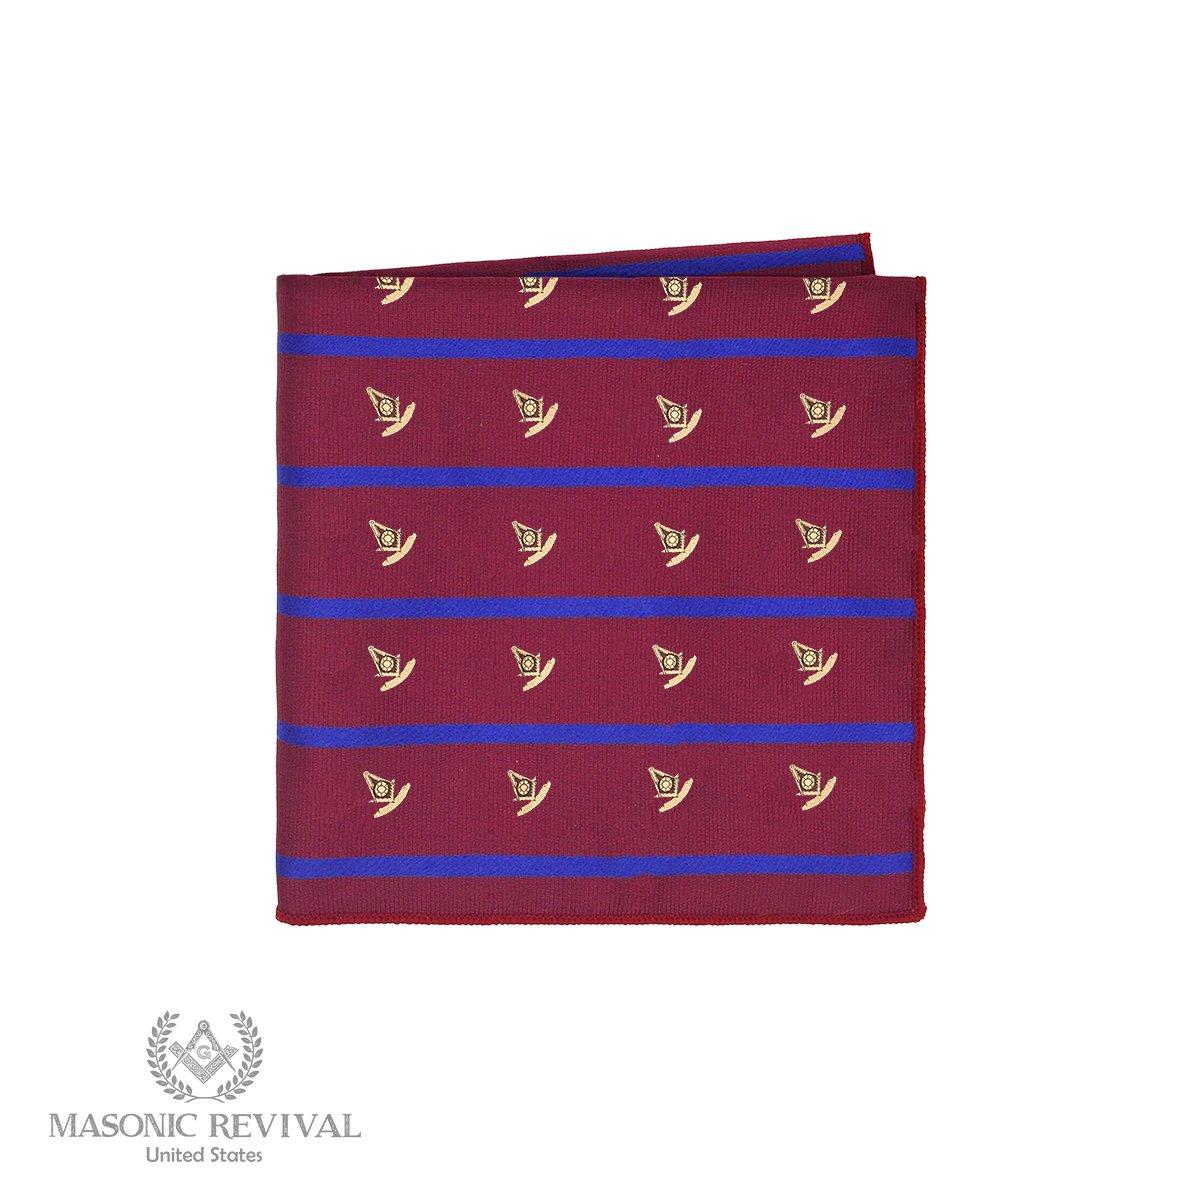 The Regal Past Master Pocket Square Handkerchief by Masonic Revival